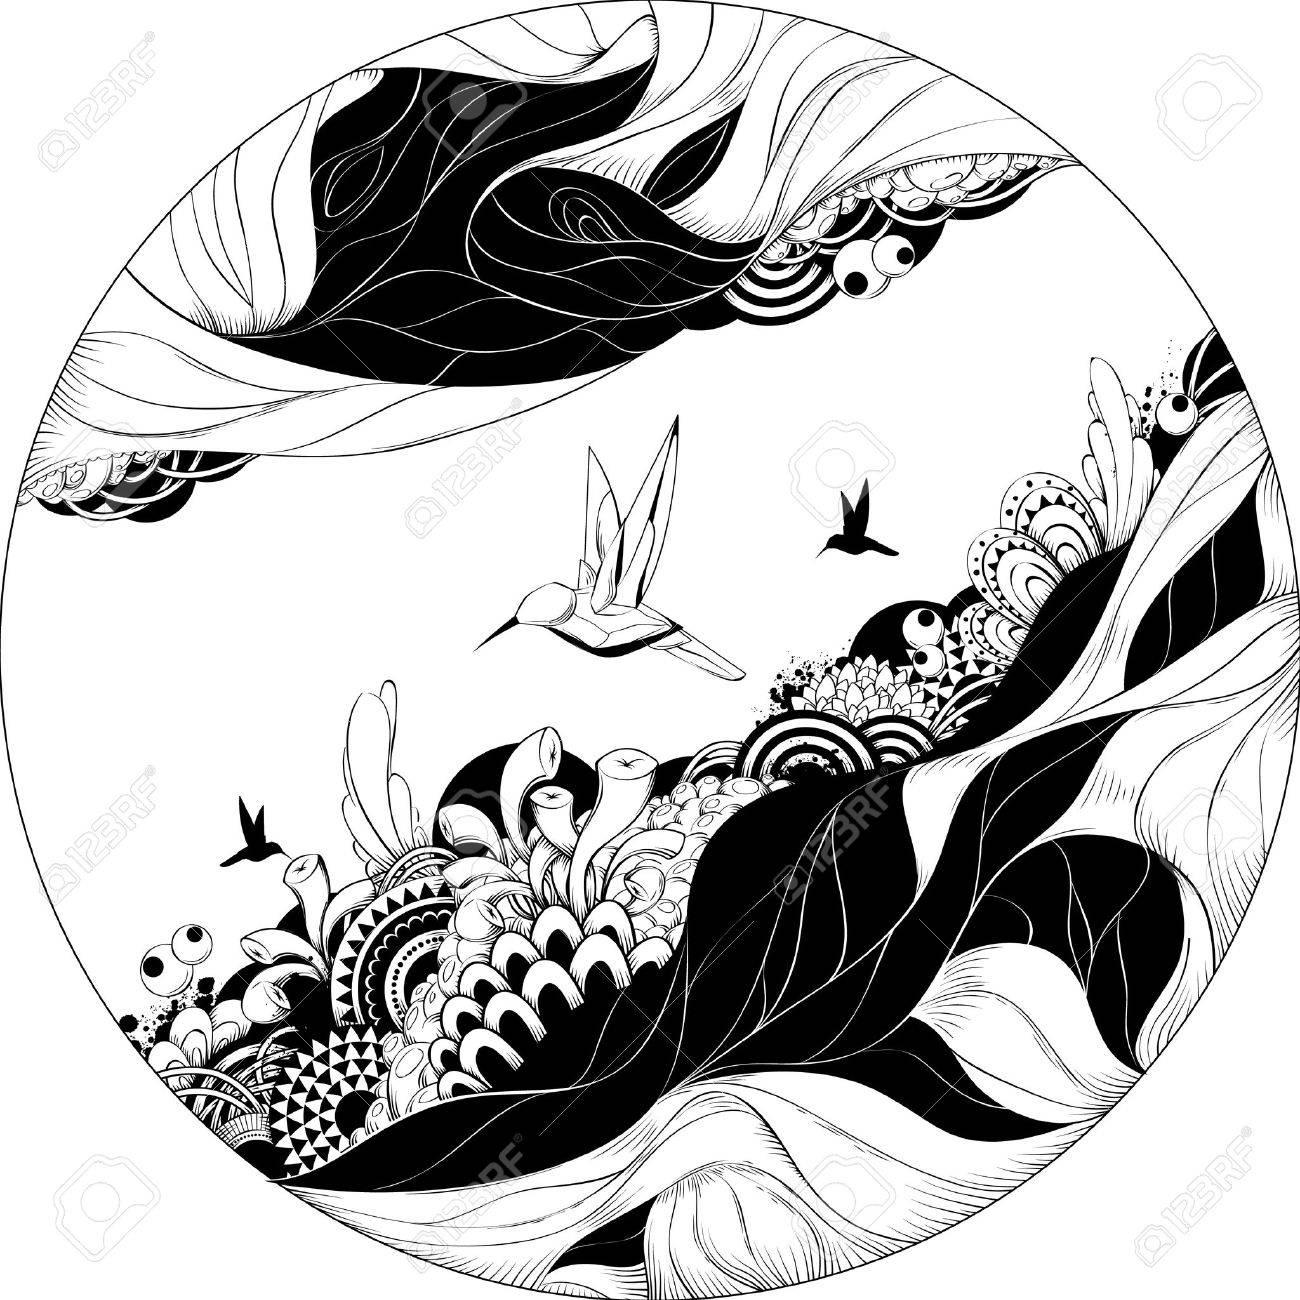 Bizarre vector illustration. Black and white ink sketch. Stock Vector - 6189060